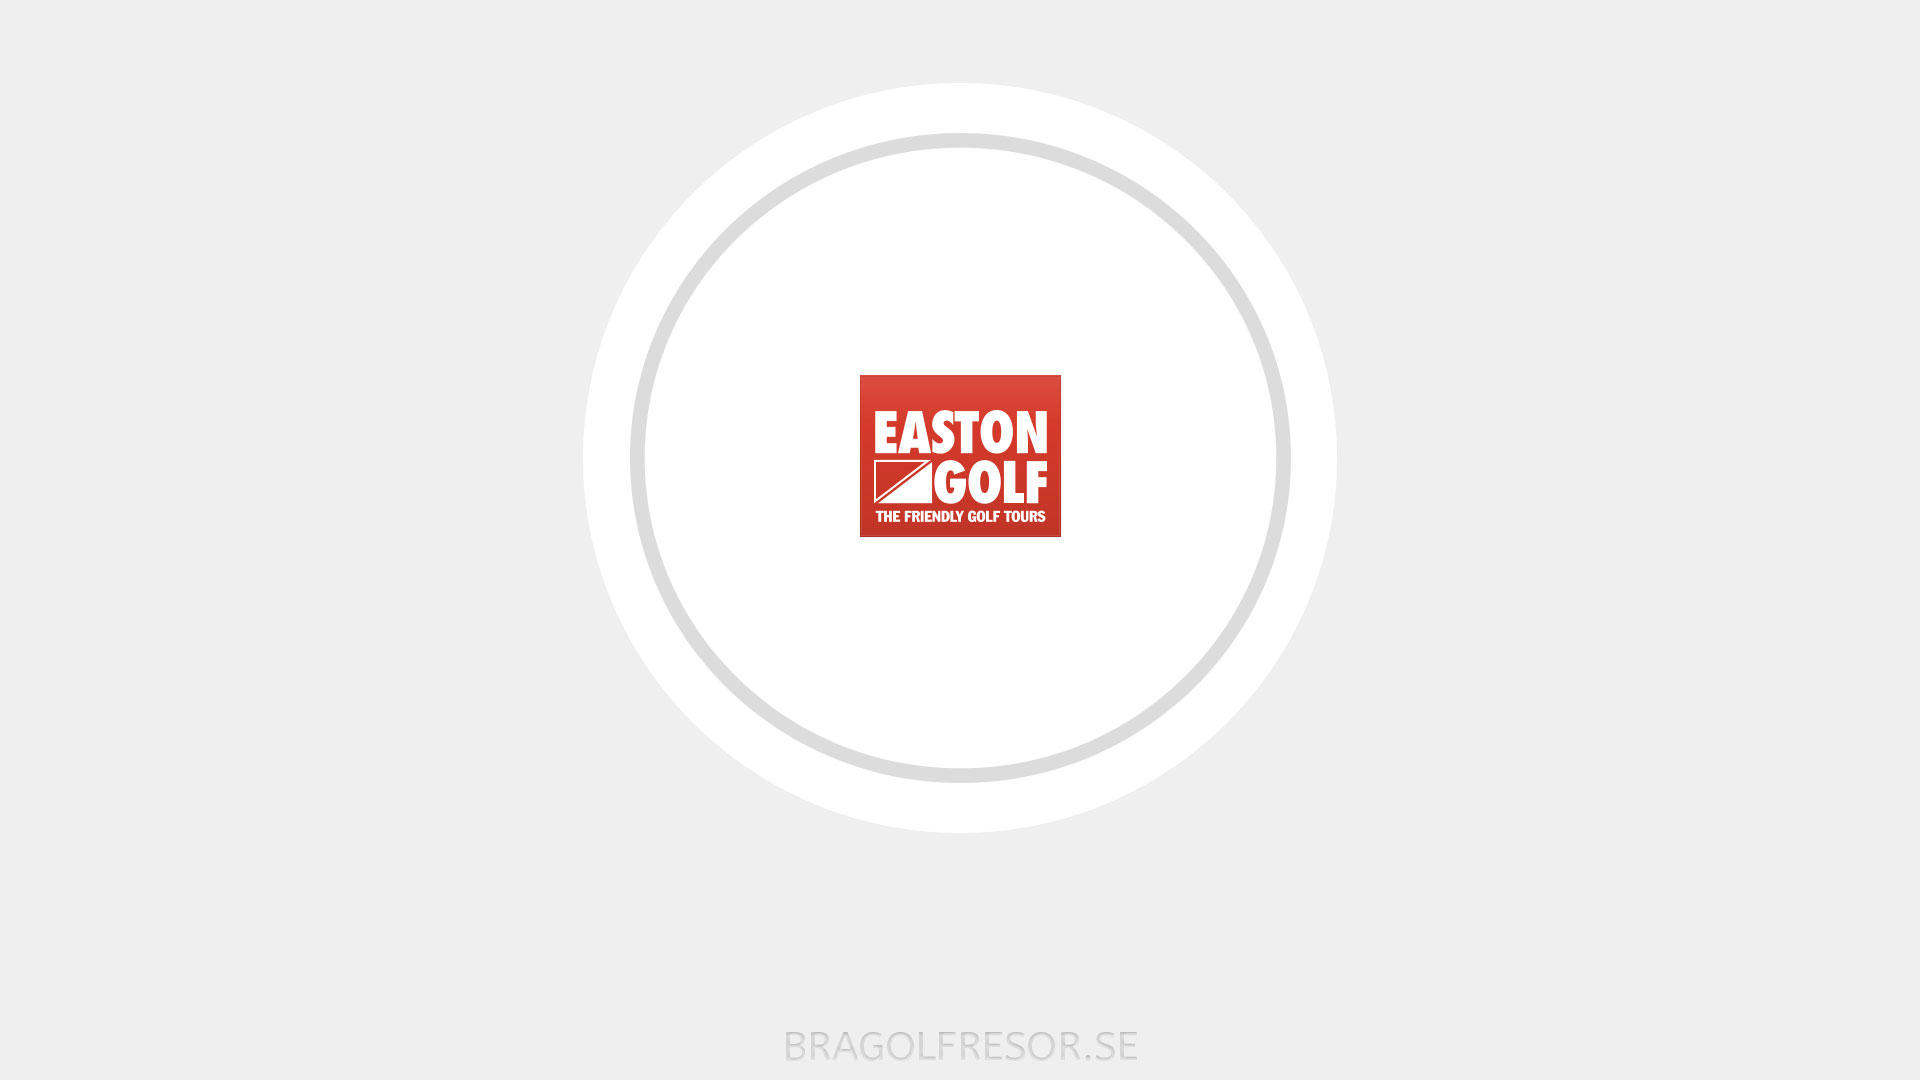 Easton Golf